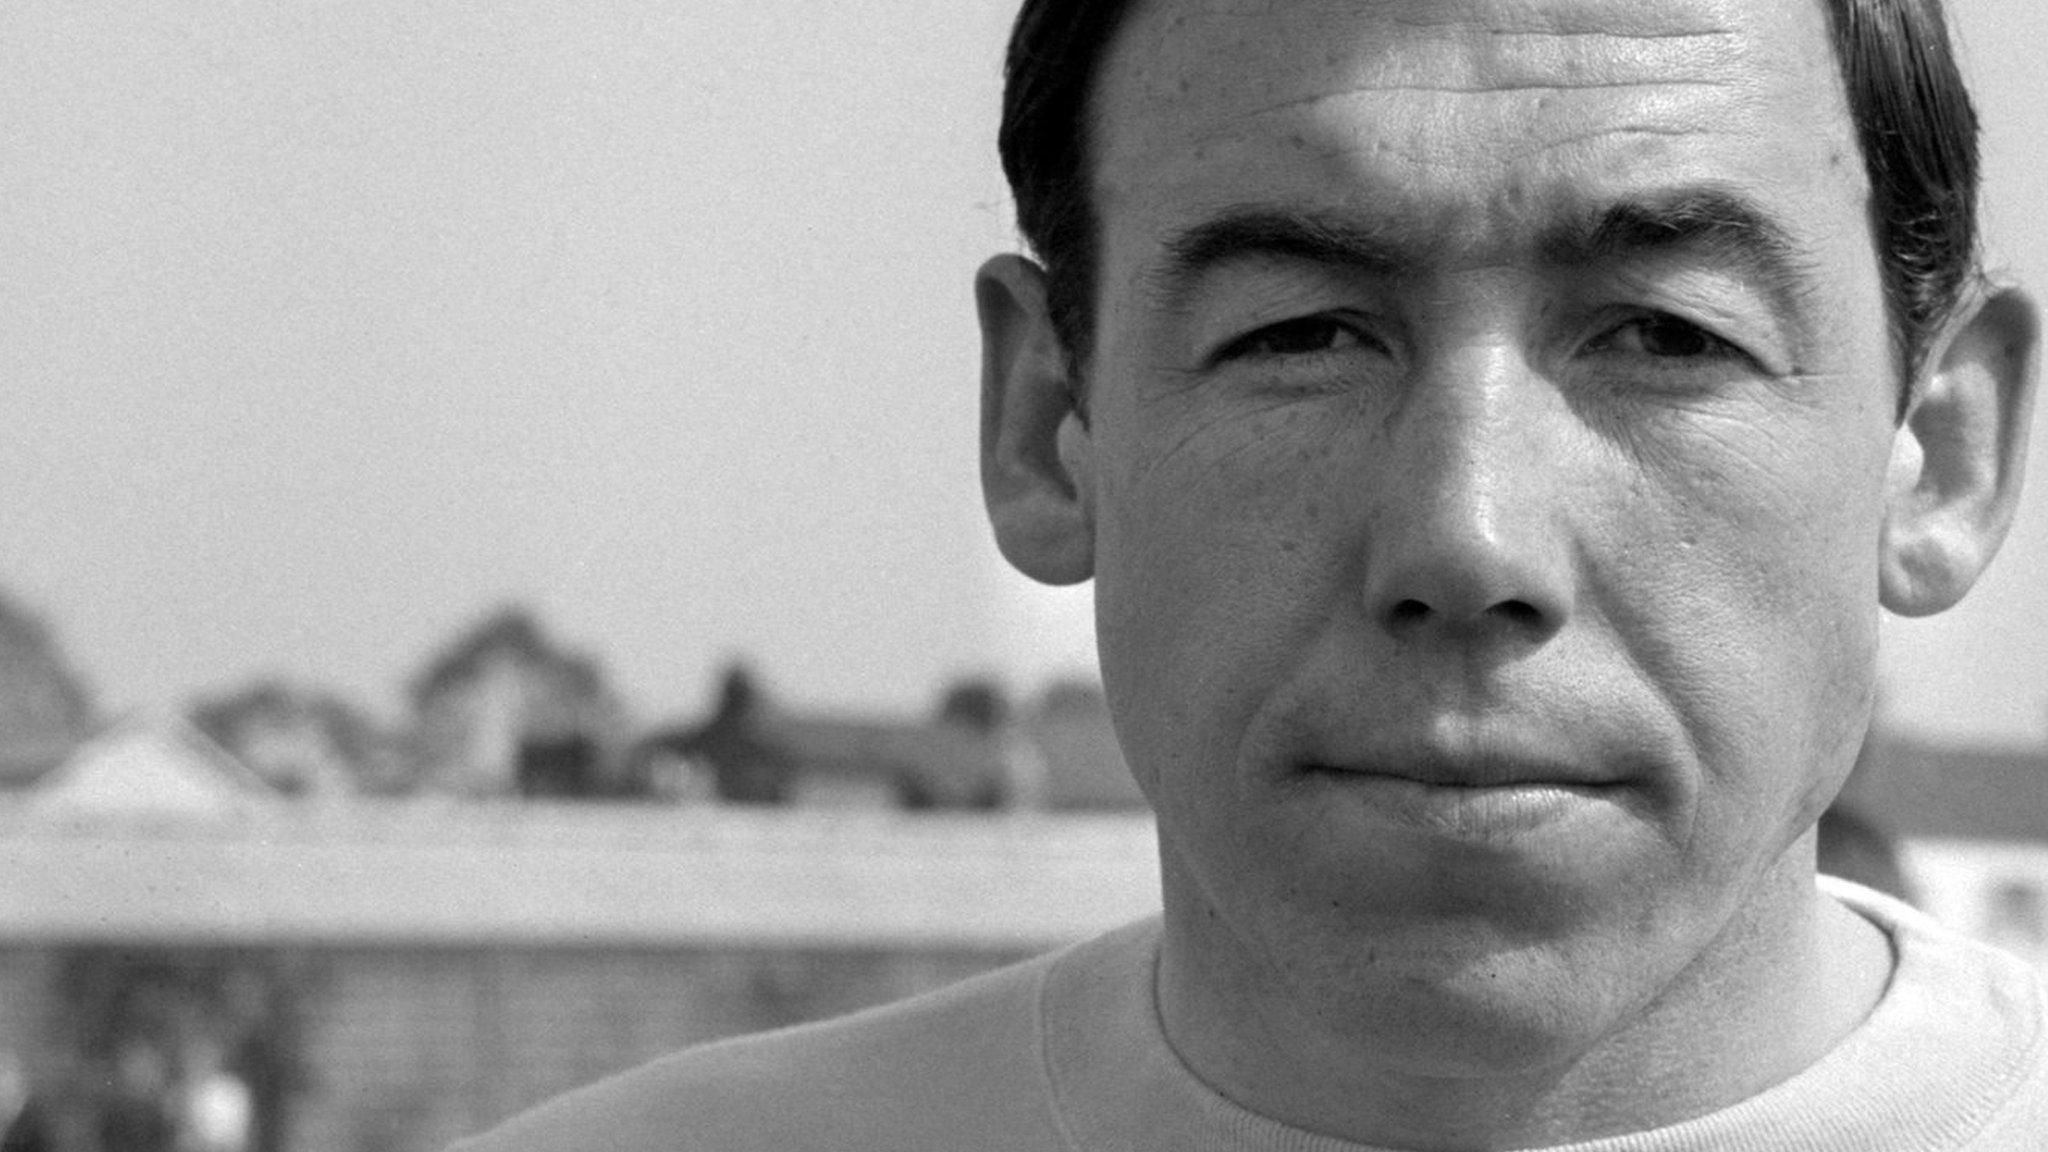 'One of the greatest' - Gordon Banks obituary